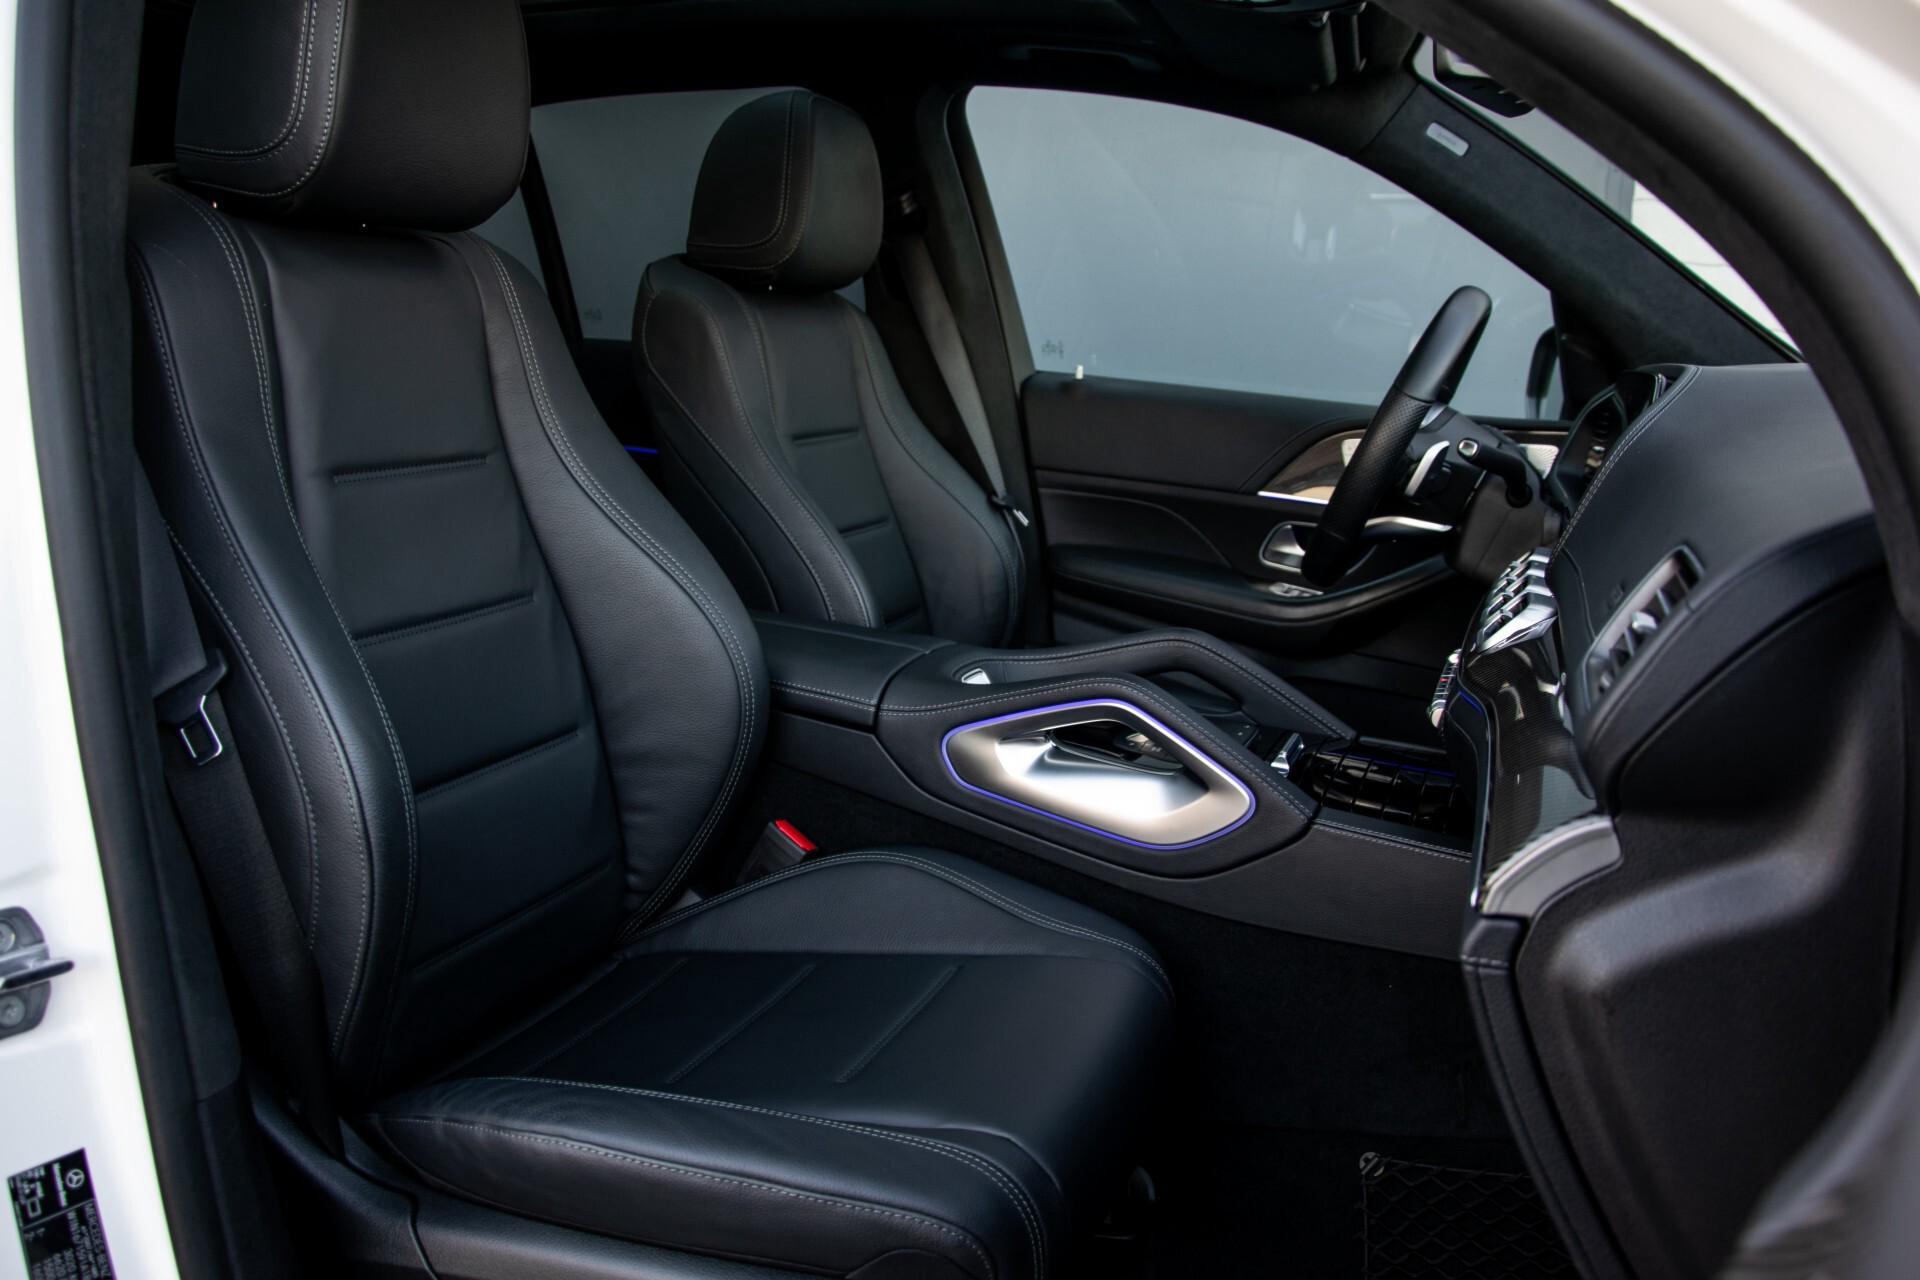 Mercedes-Benz GLE 450 4-M AMG Night/Carbon/Designo/Standkachel/Rij-assist/Keyless/Burmester Aut9 Foto 3